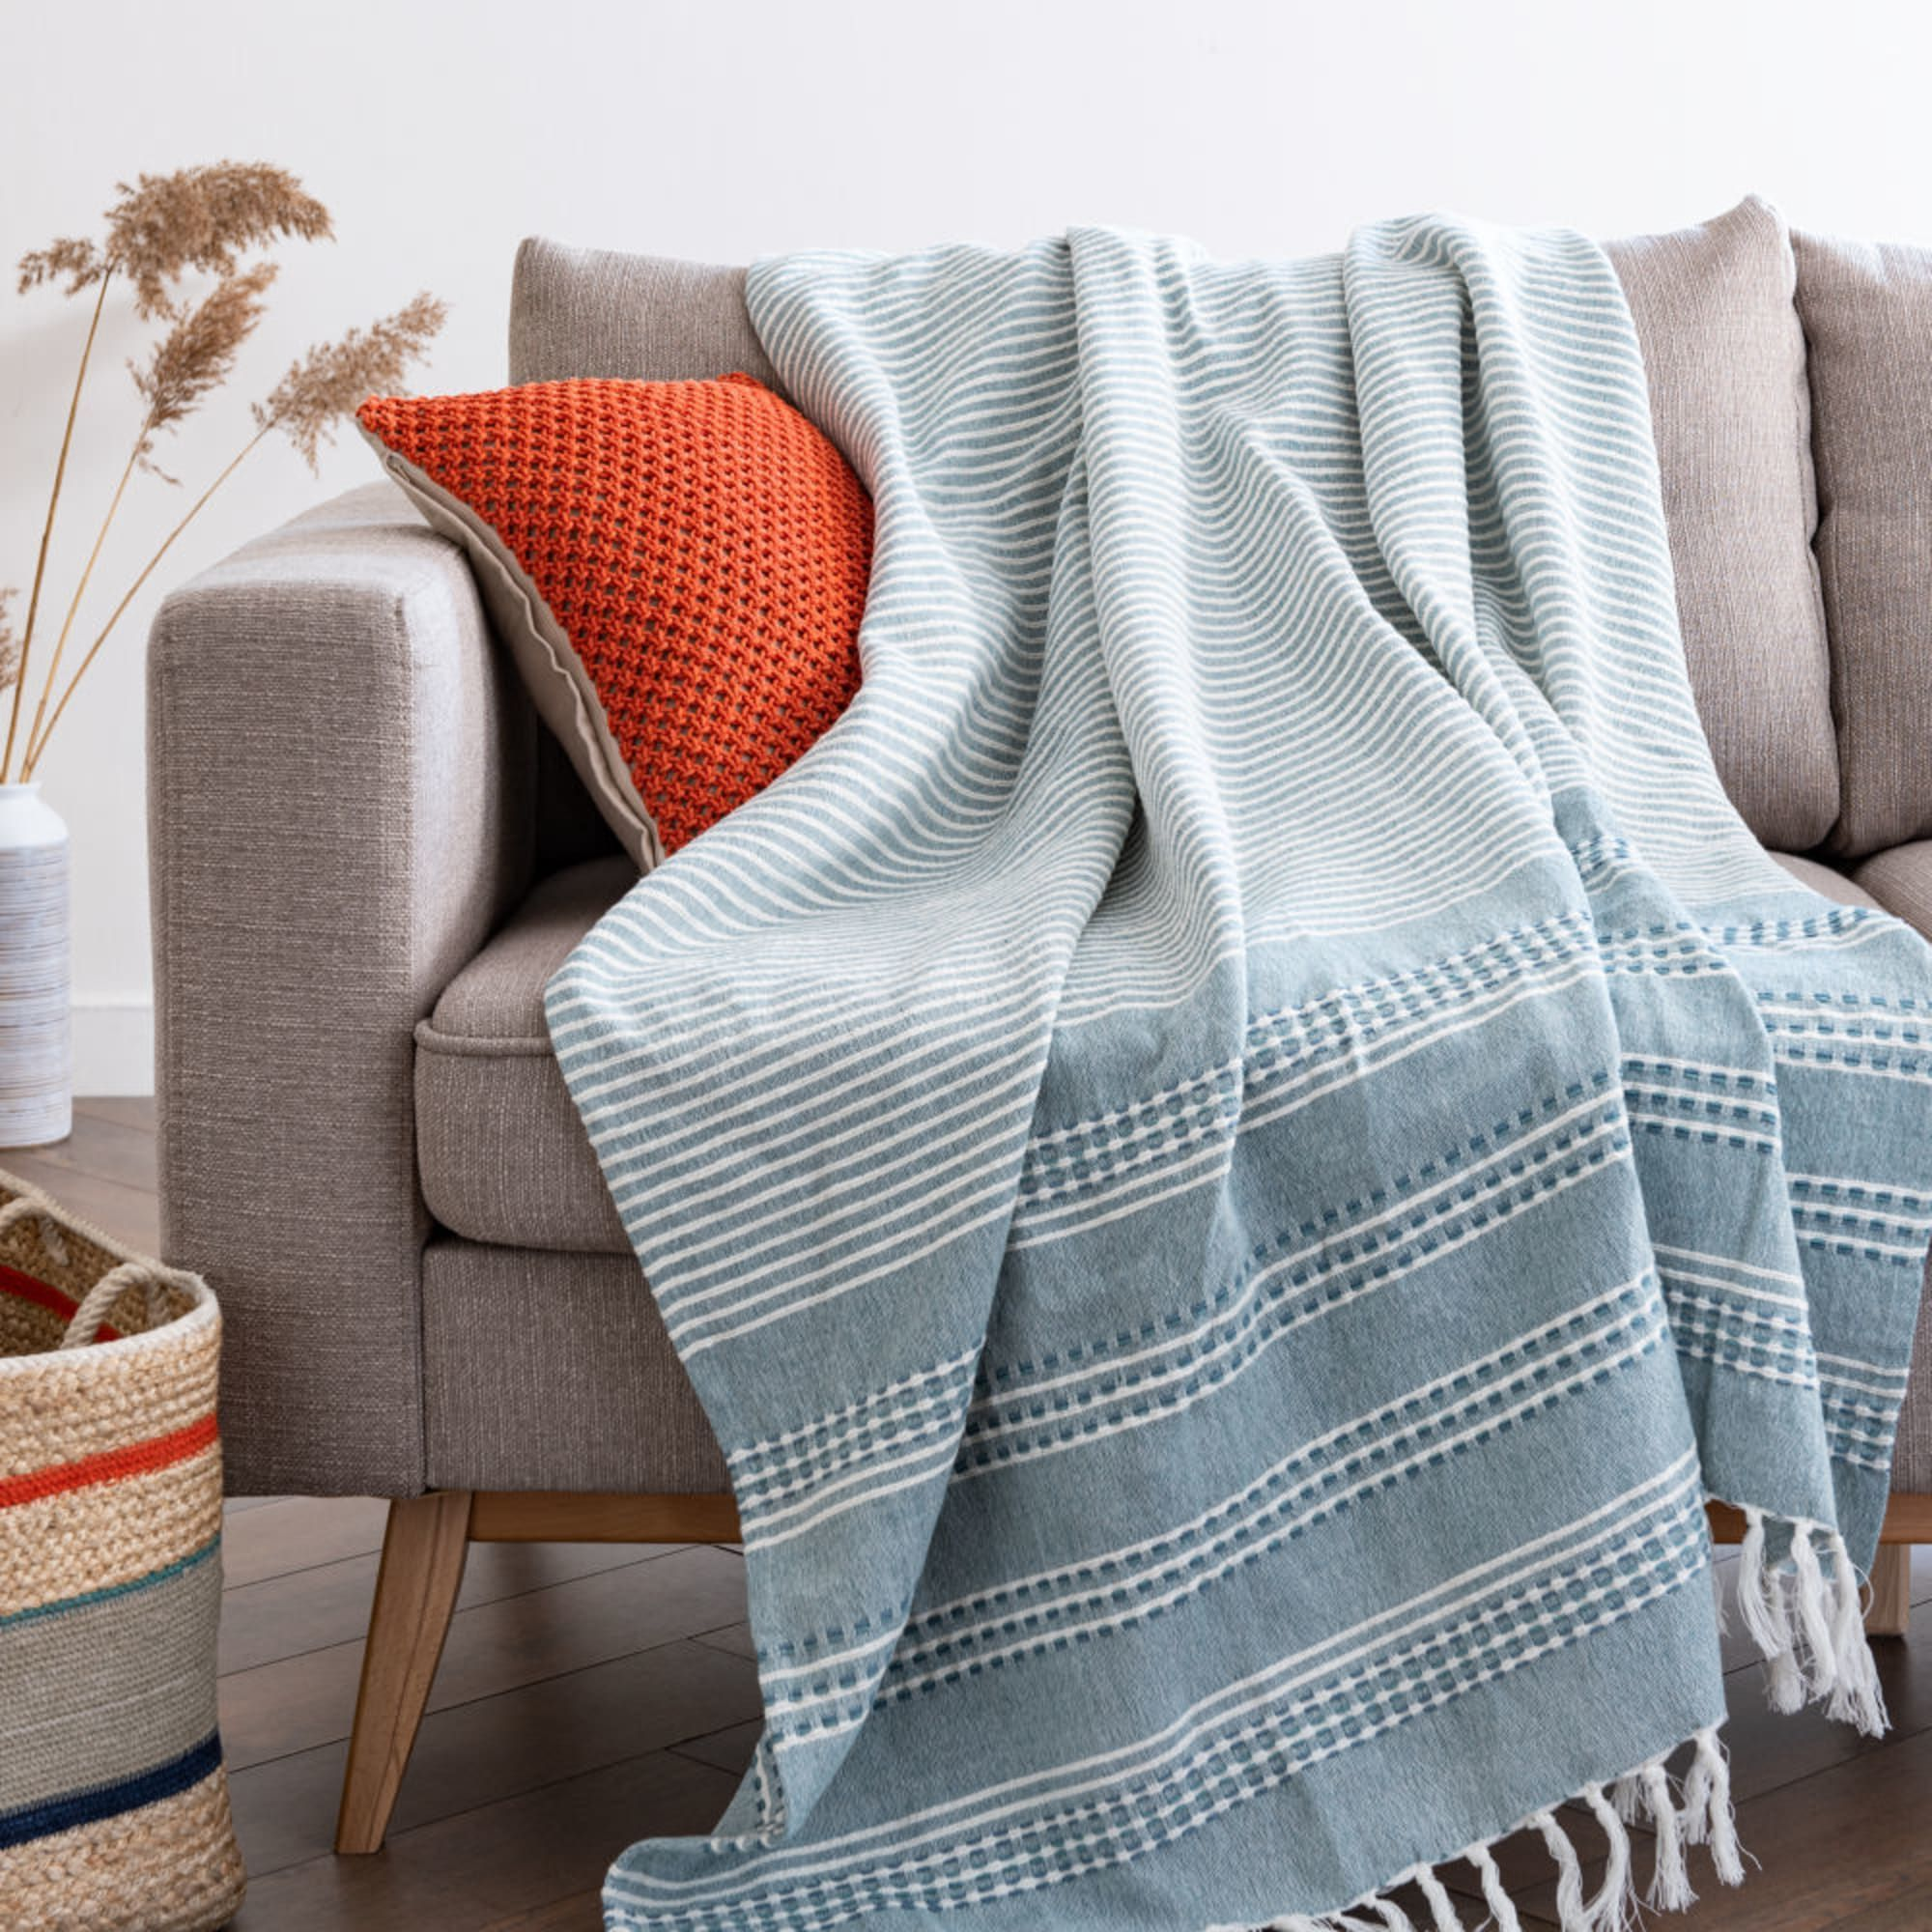 Ecru Cotton Throw With Blue Striped Pattern 160x210 Pascais Maisons Du Monde Riscas Manta